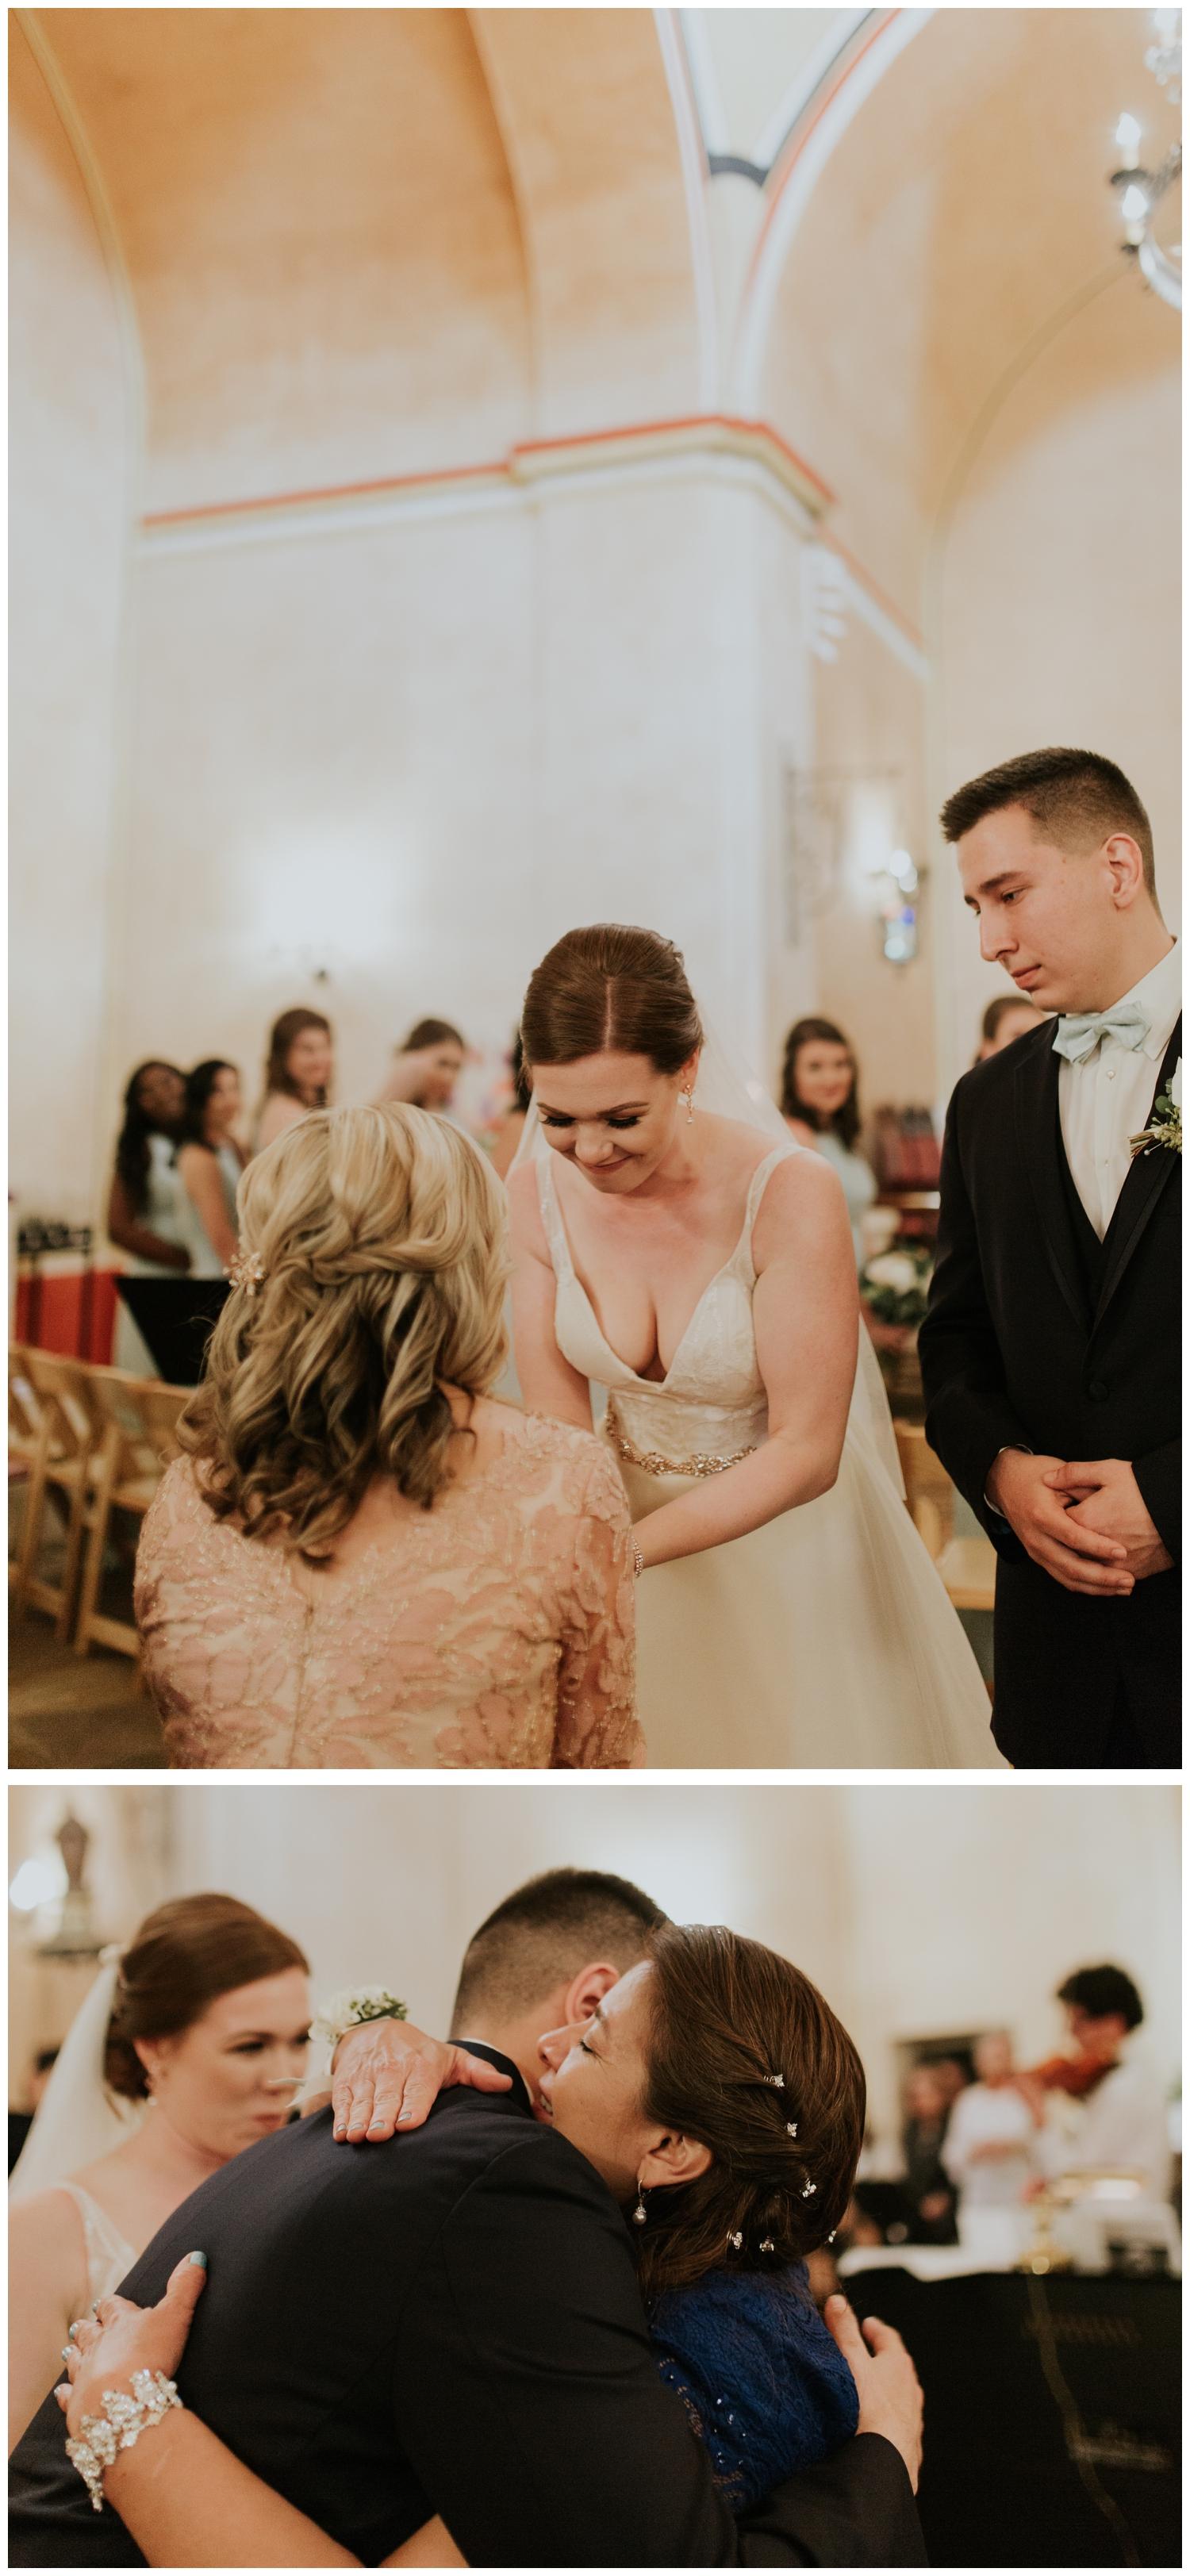 Jenna+Brandon, Mission Concepcion Wedding, San Antonio, Contista Productions Wedding Photography_0129.jpg